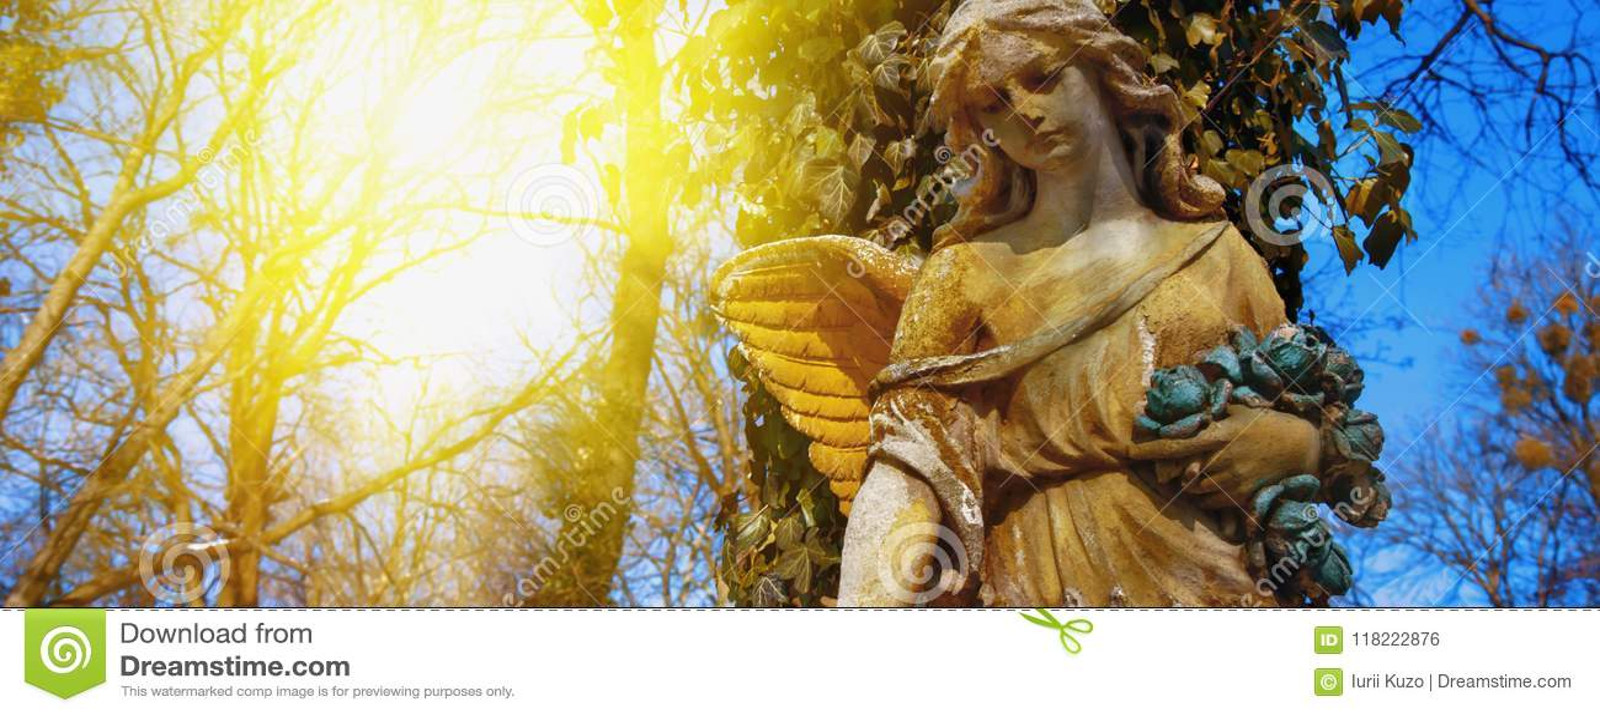 Vista majestosa da est?tua do anjo dourado iluminada pela luz solar